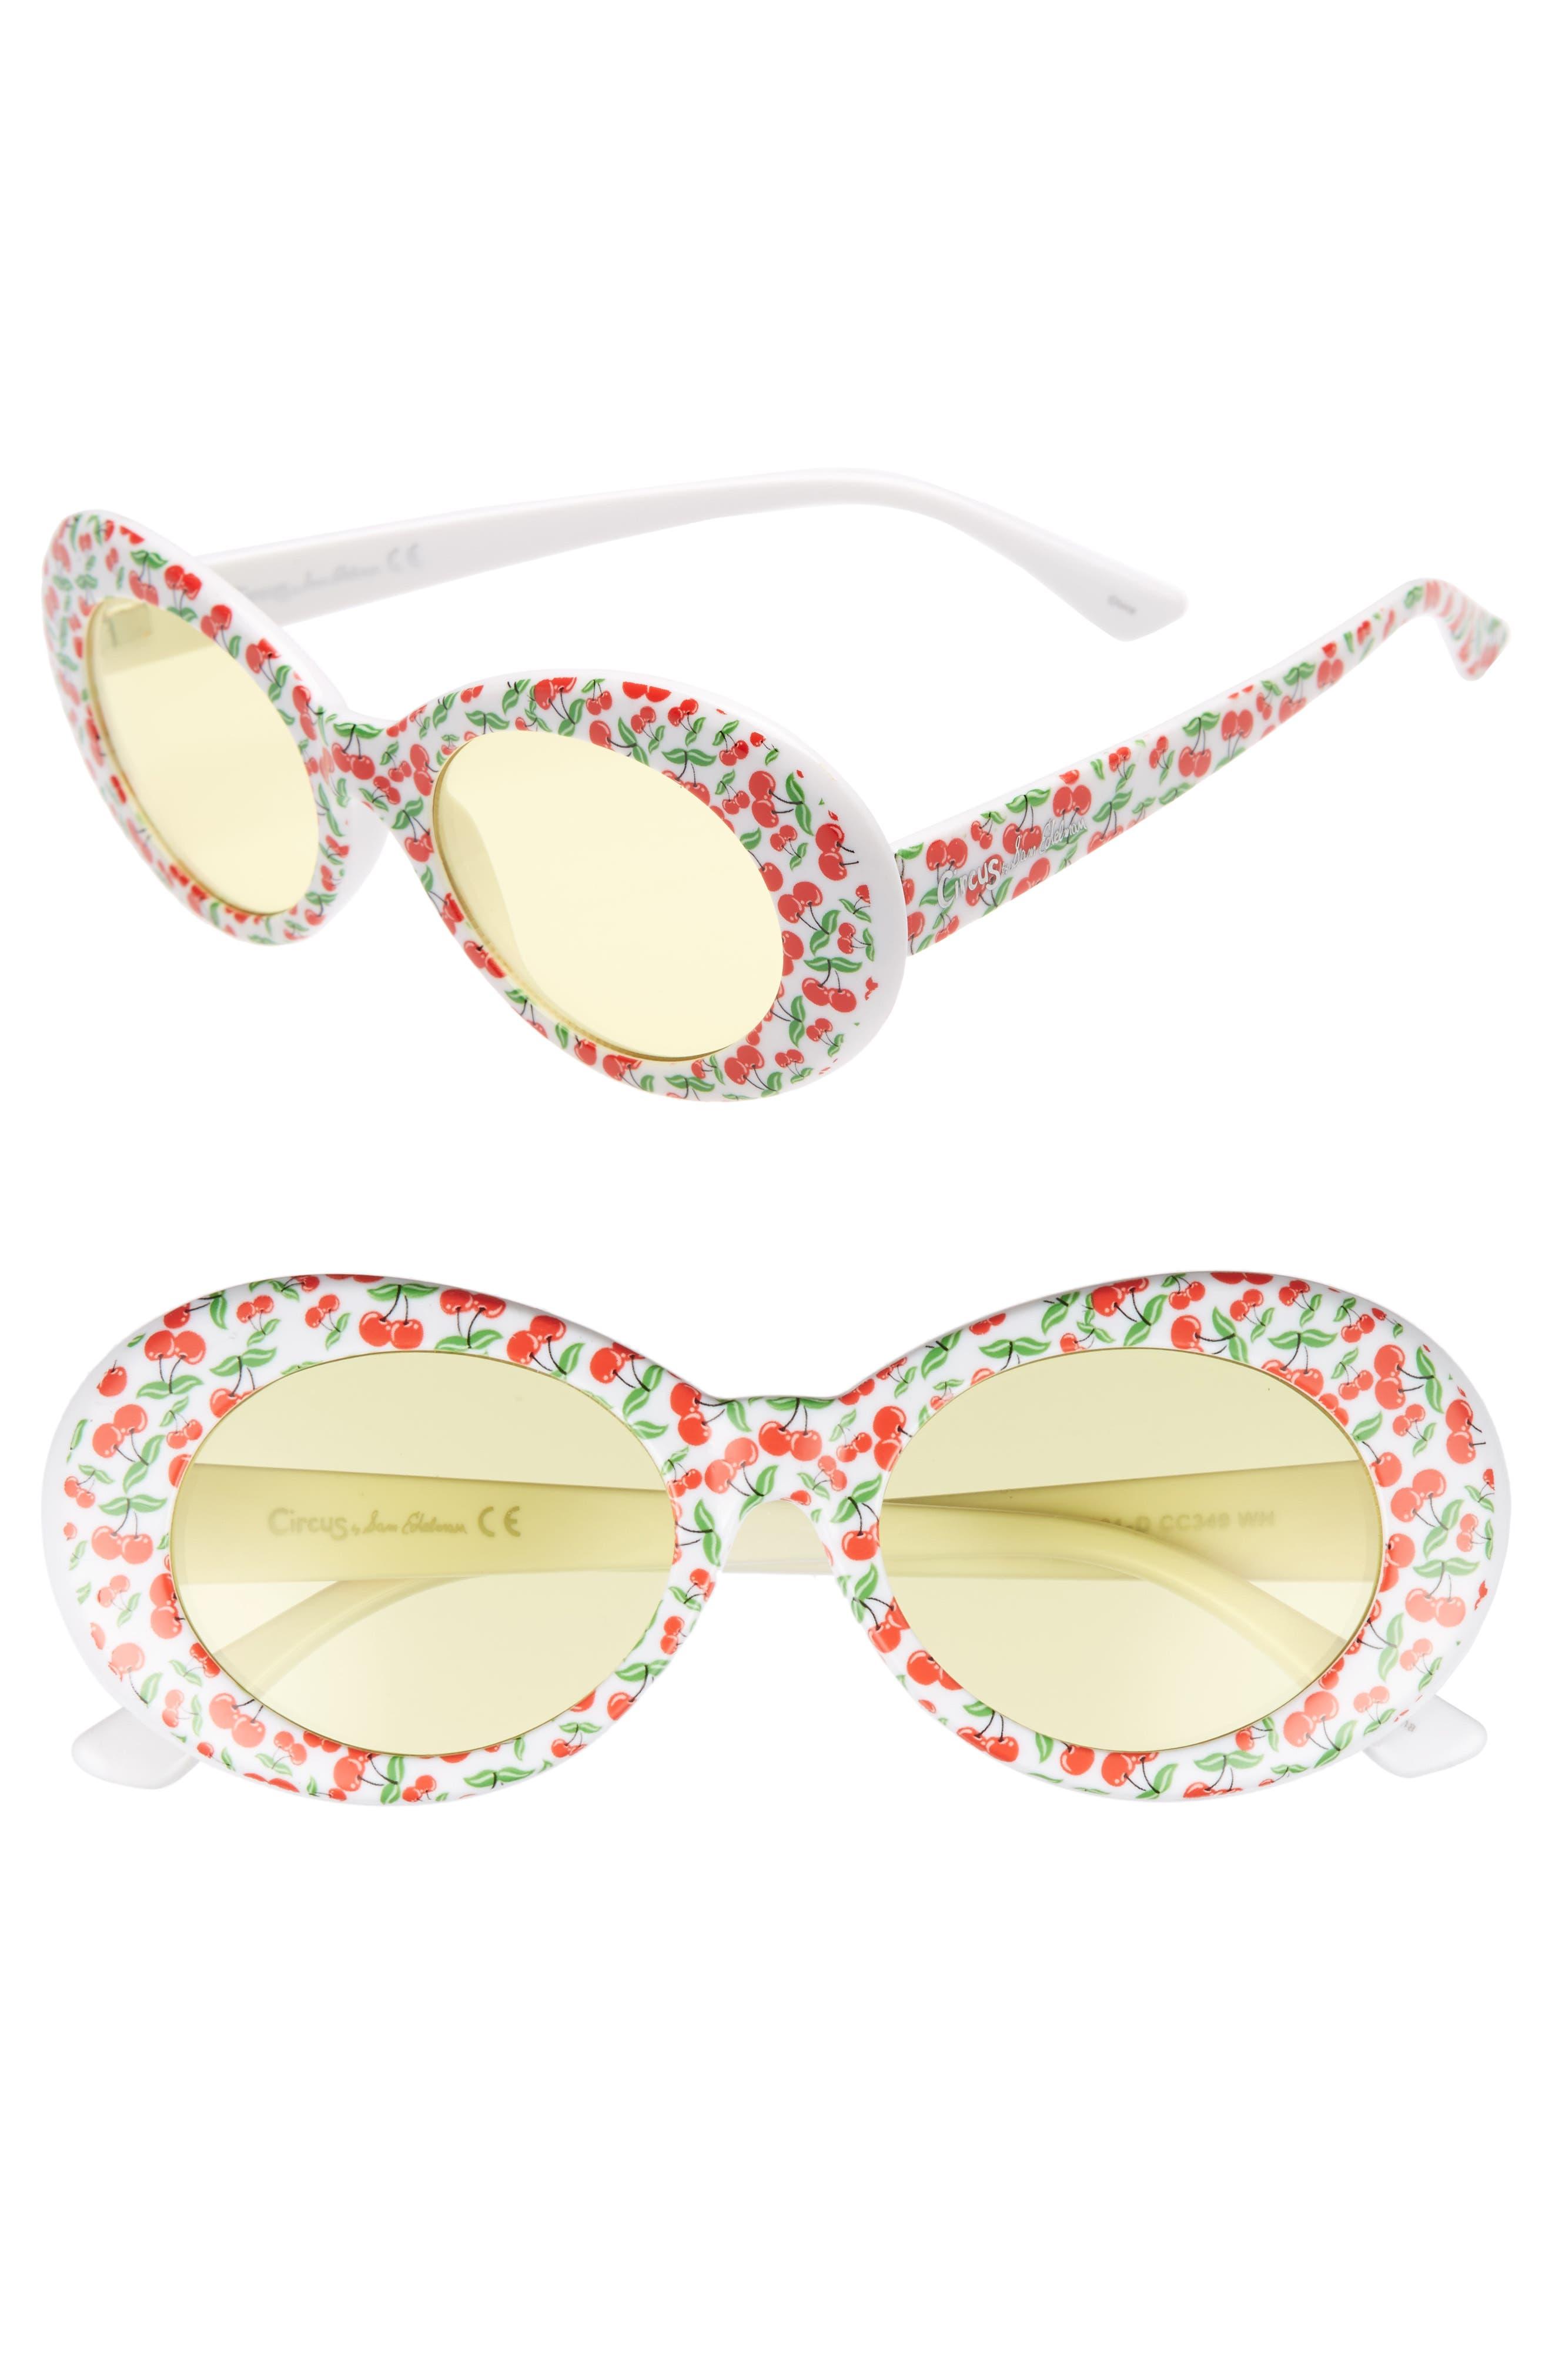 50mm Cherry Print Oval Sunglasses,                             Main thumbnail 2, color,